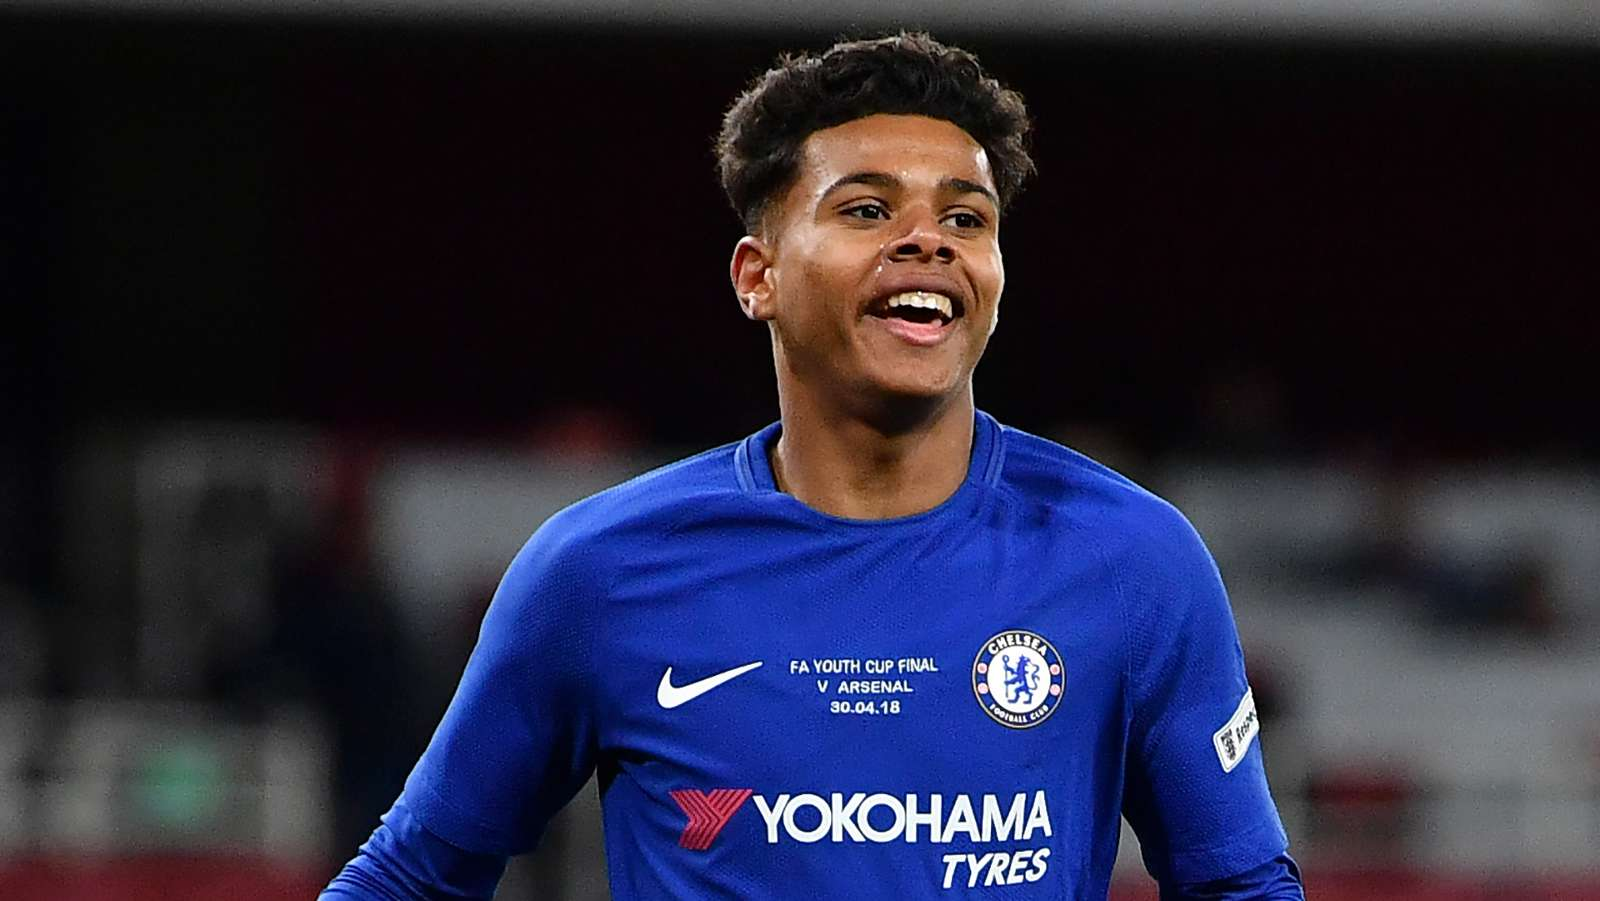 Nigeria teenager Anjorin makes Premier League debut - Sports Leo